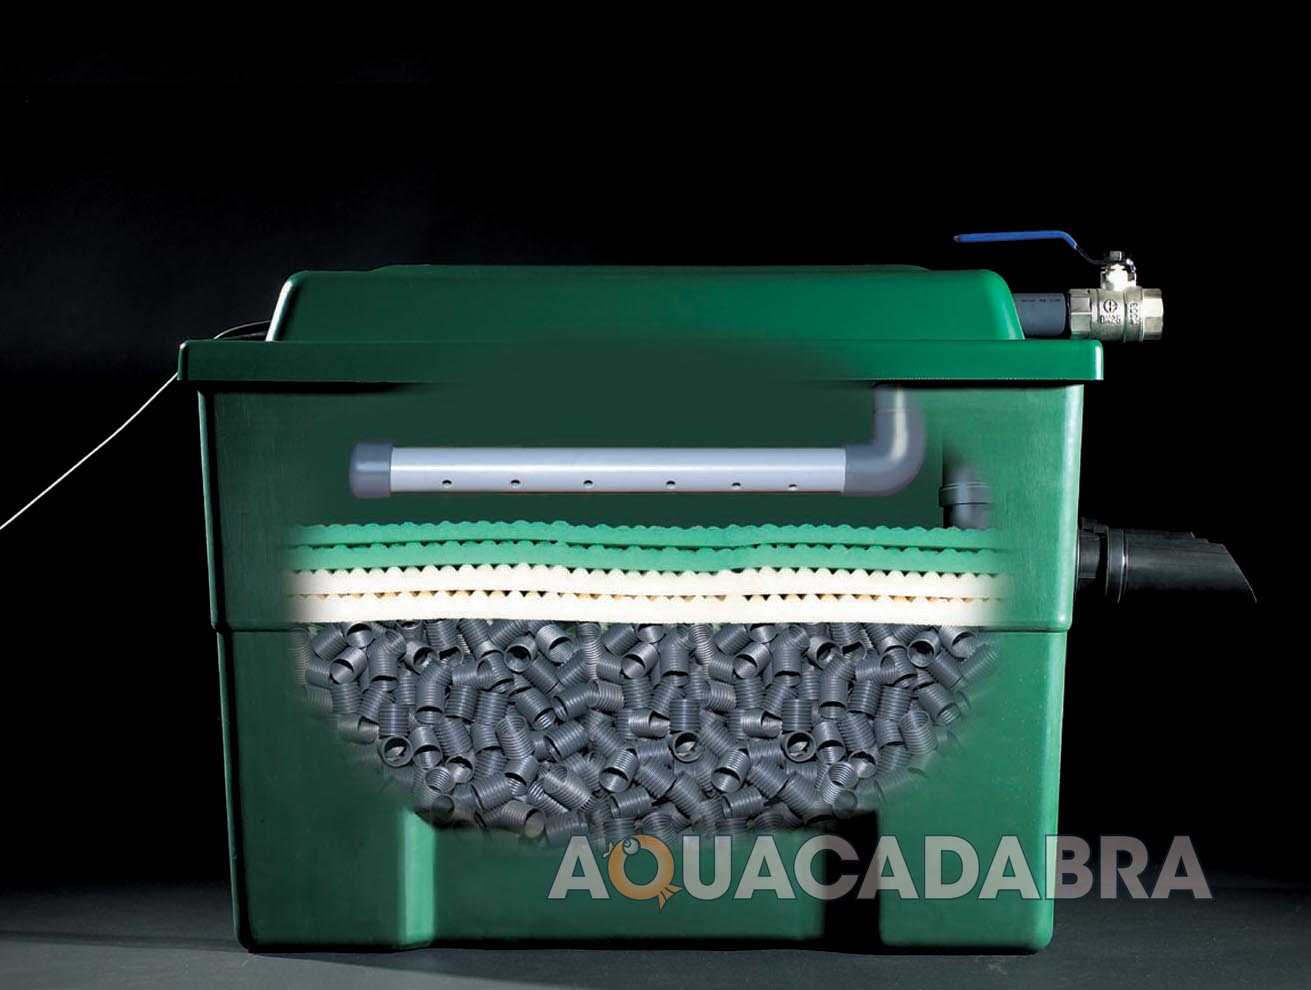 Lotus Green Genie 6500 Uv Filter Box 18w Water Clarifier